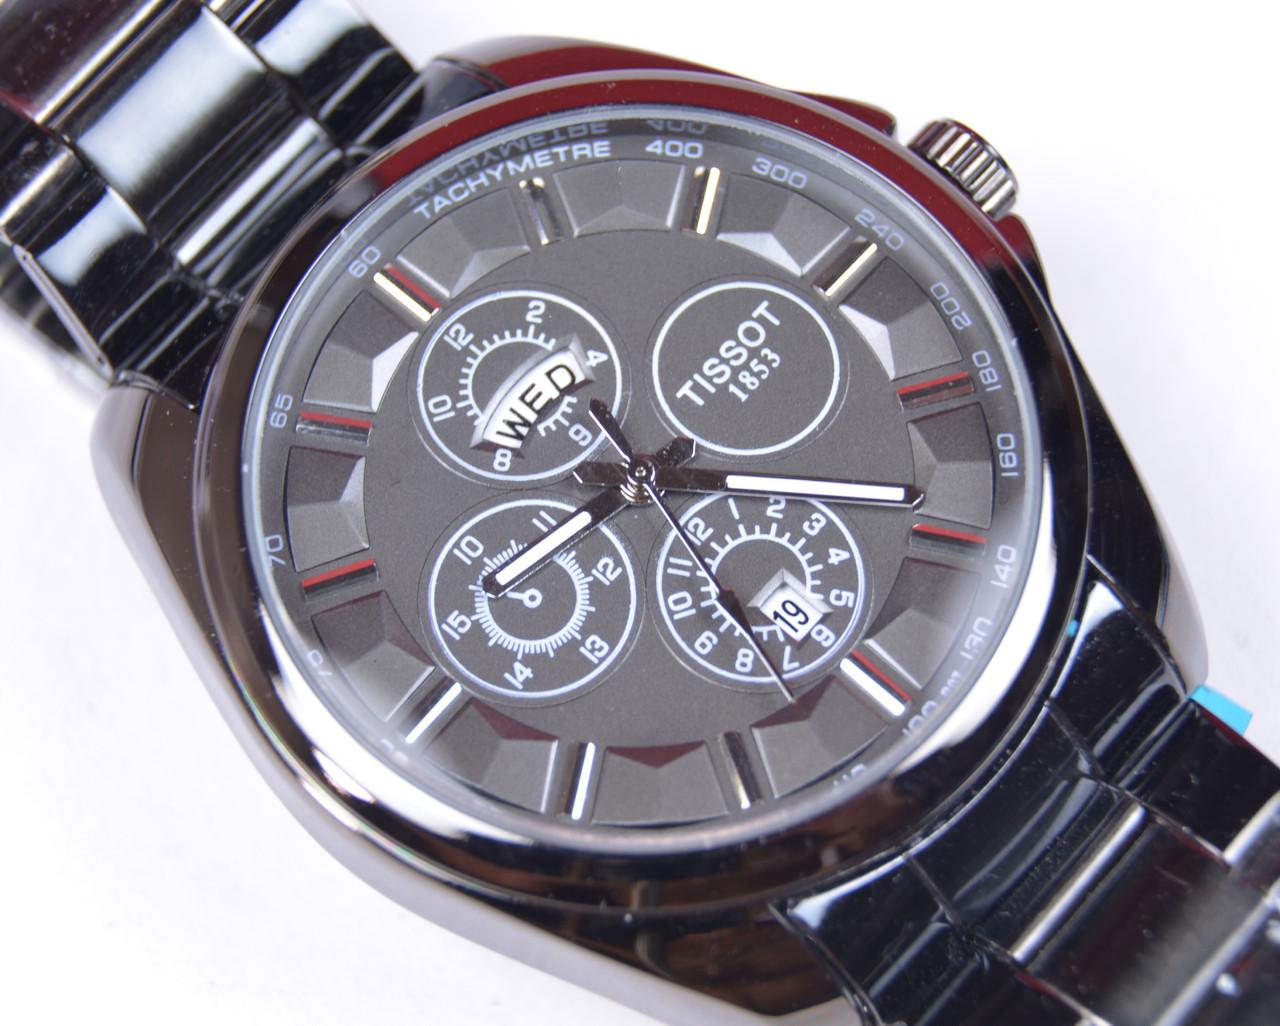 Мужские наручные часы Couturier T035 копия